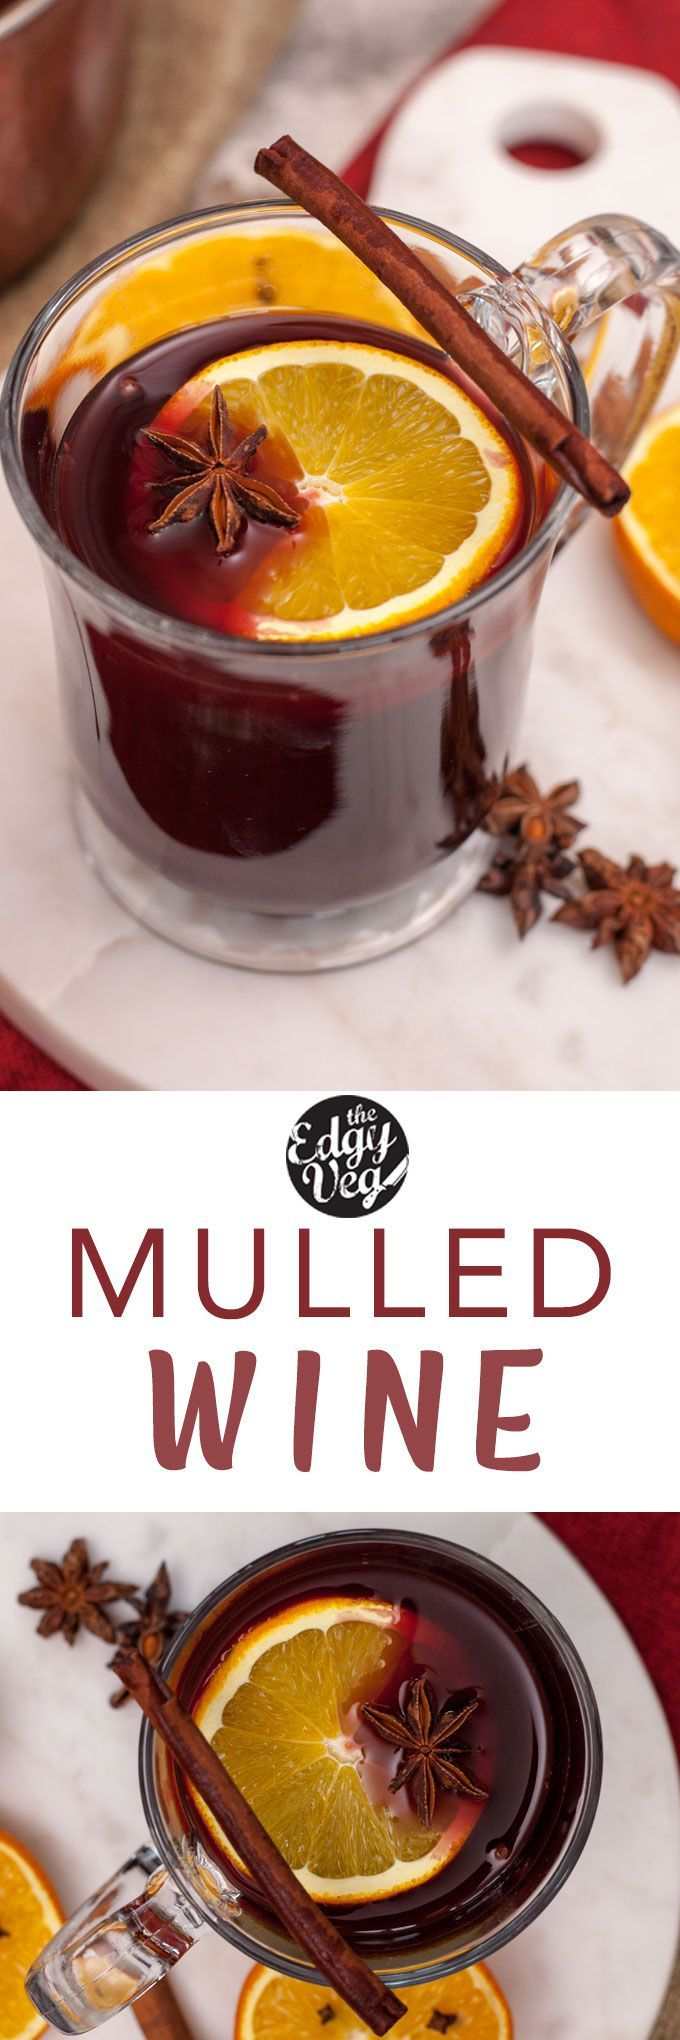 Traditional German Hot Mulled Wine Gluhwein Recipe